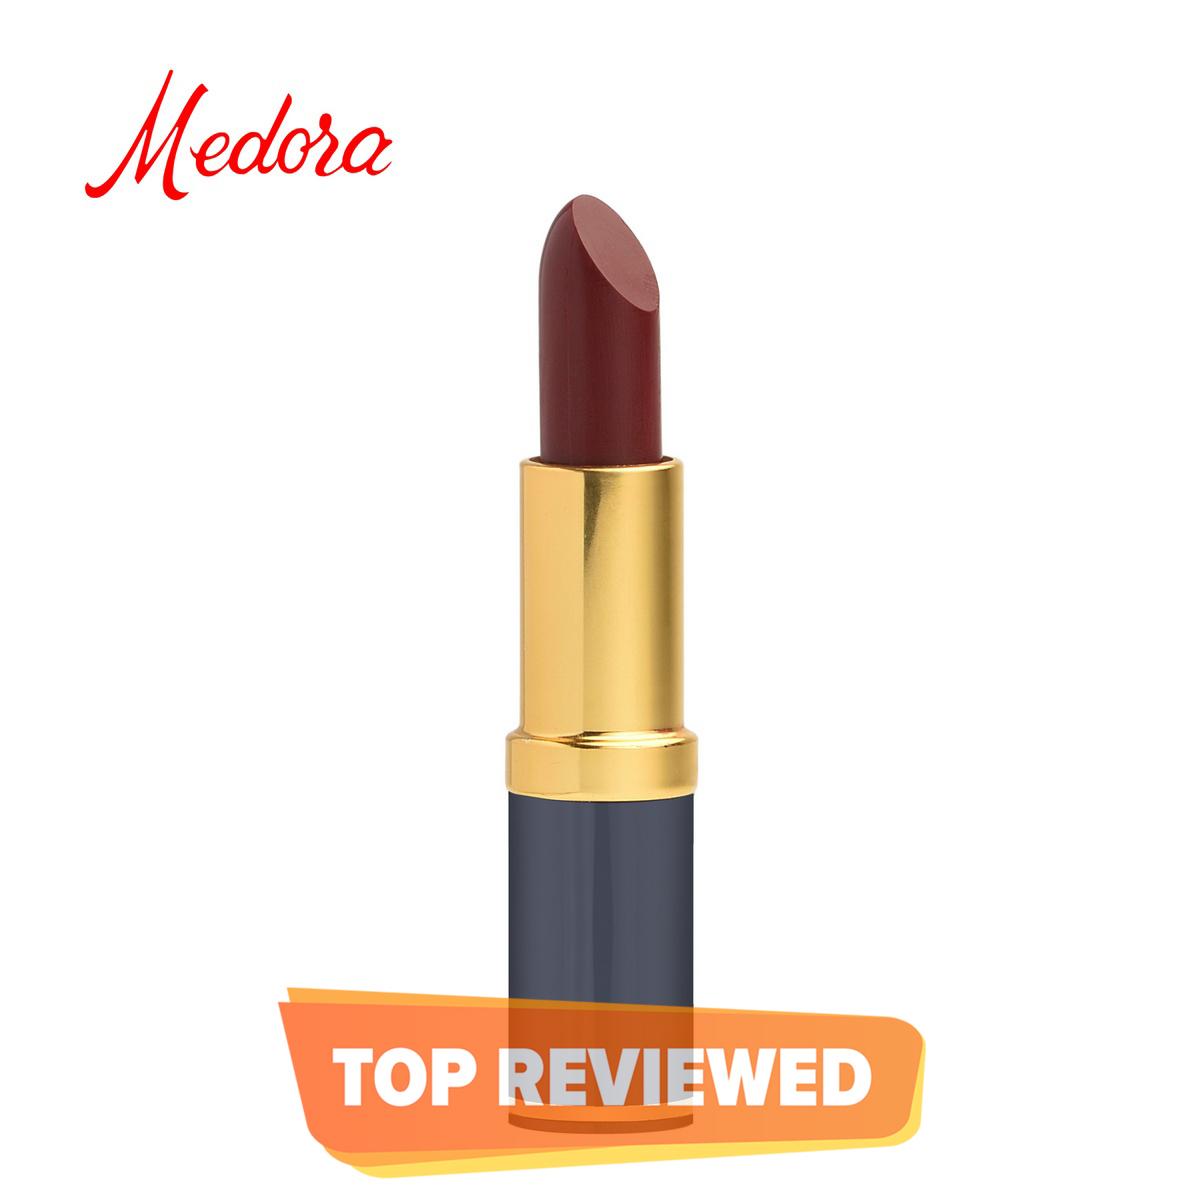 MEDORA Matte Lipstick- 284 TRUE MAROON